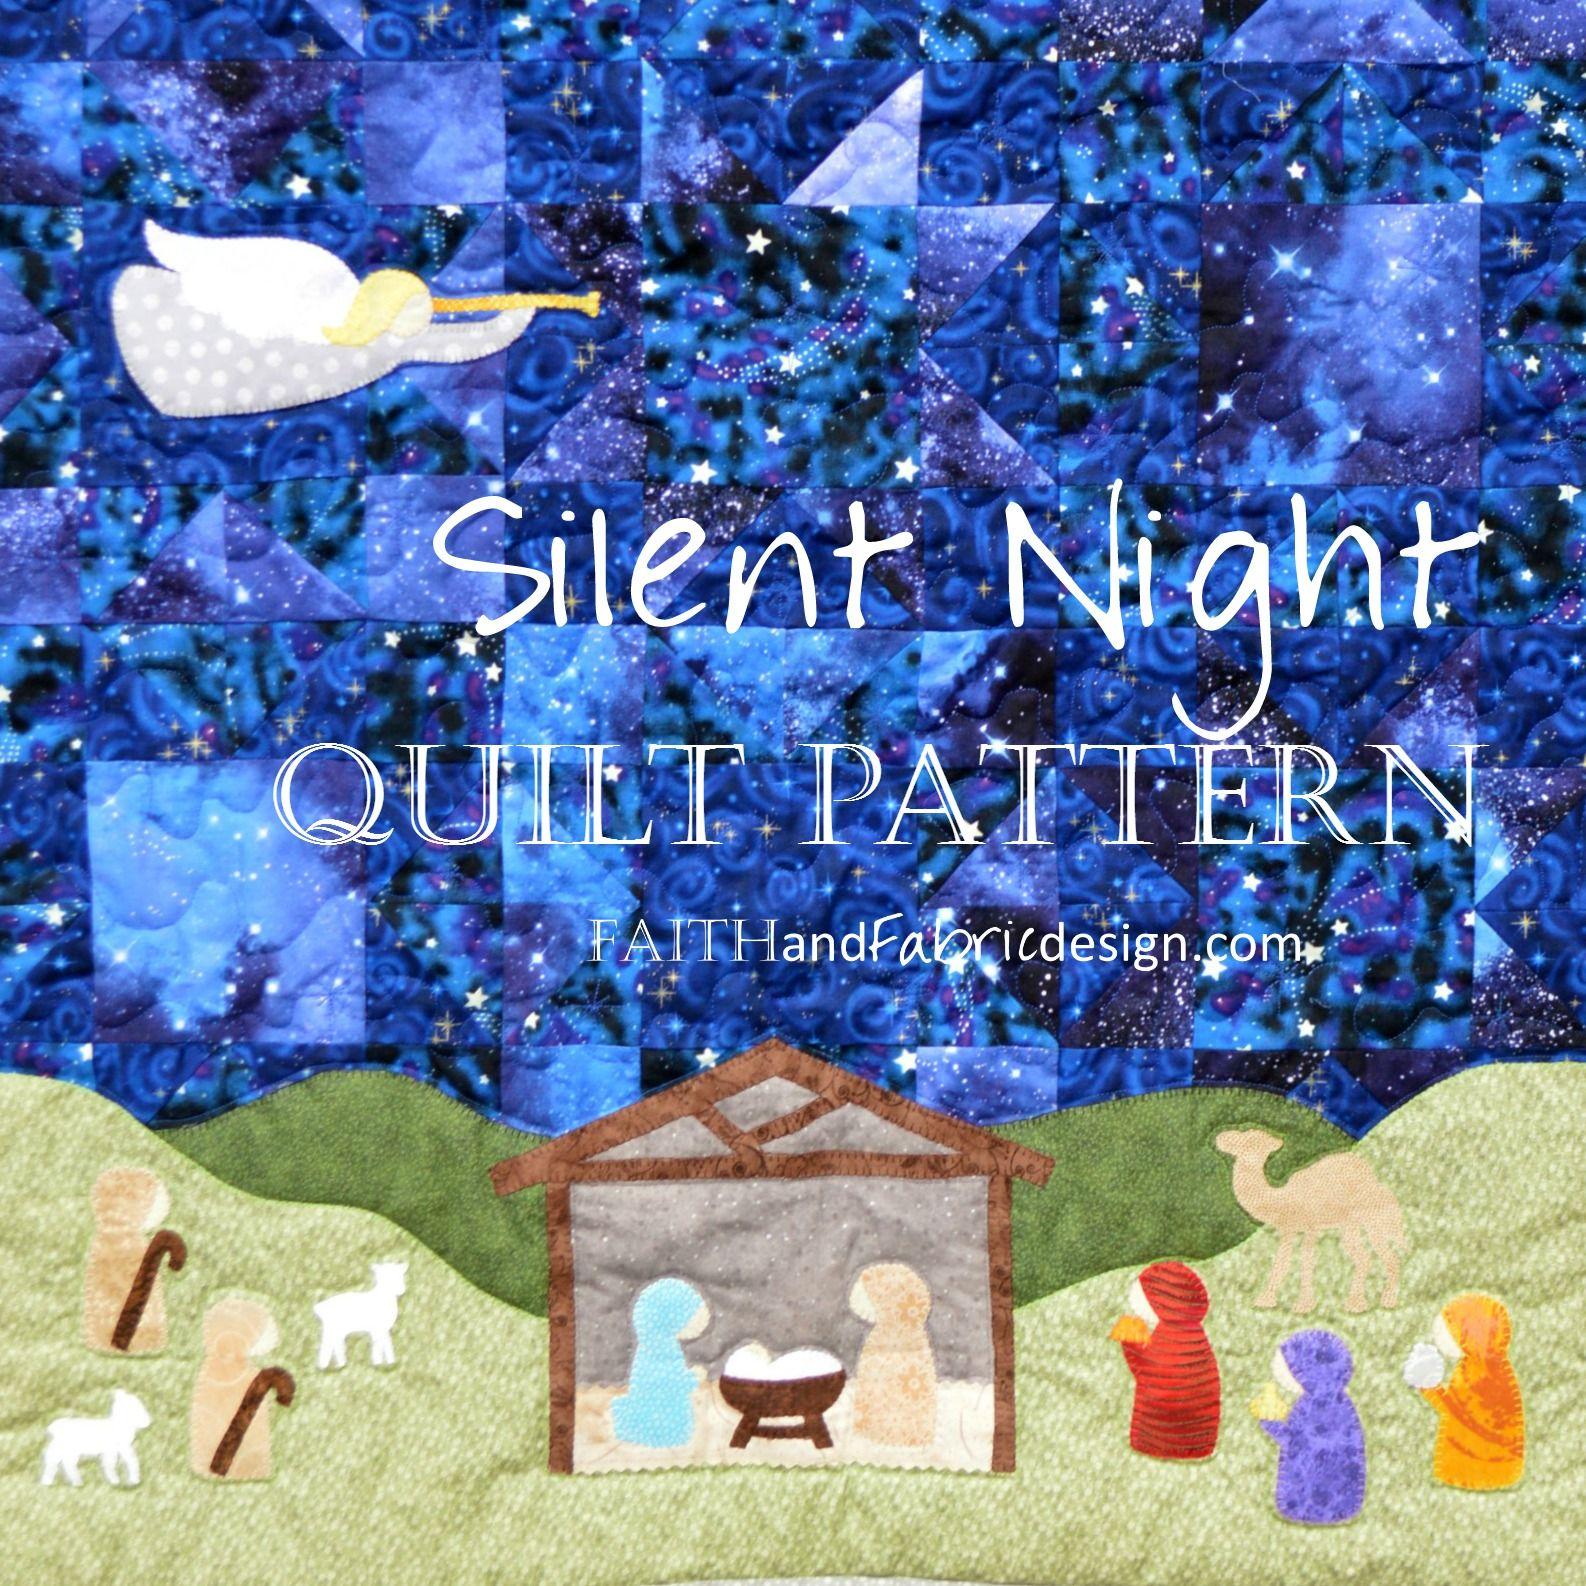 Nativity Quilt Pattern - Silent Night, A Christmas Quilt ... : nativity quilt pattern - Adamdwight.com